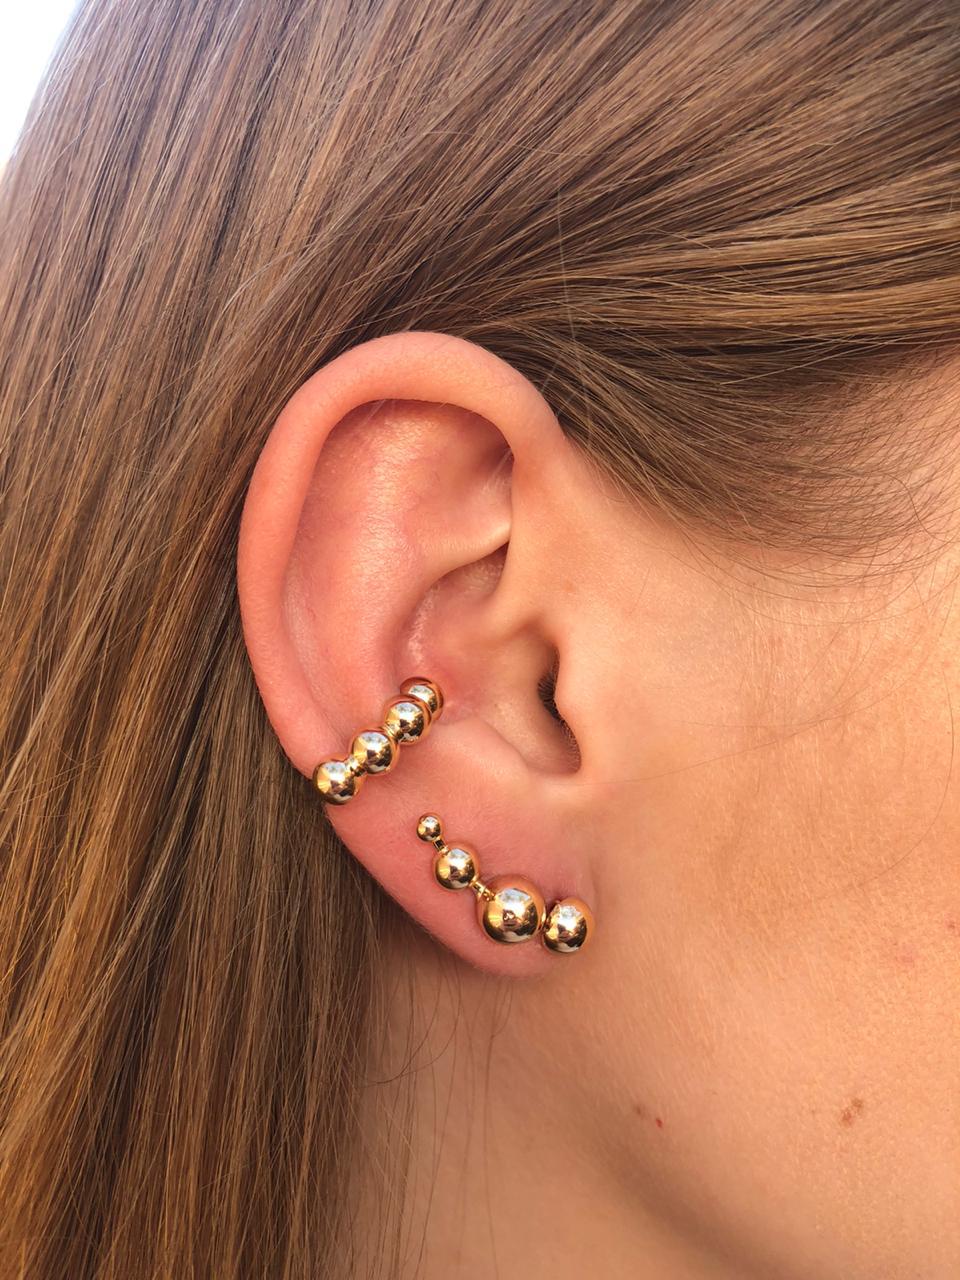 Piercing fake de orelha 4 esferas banhado a ouro 18k